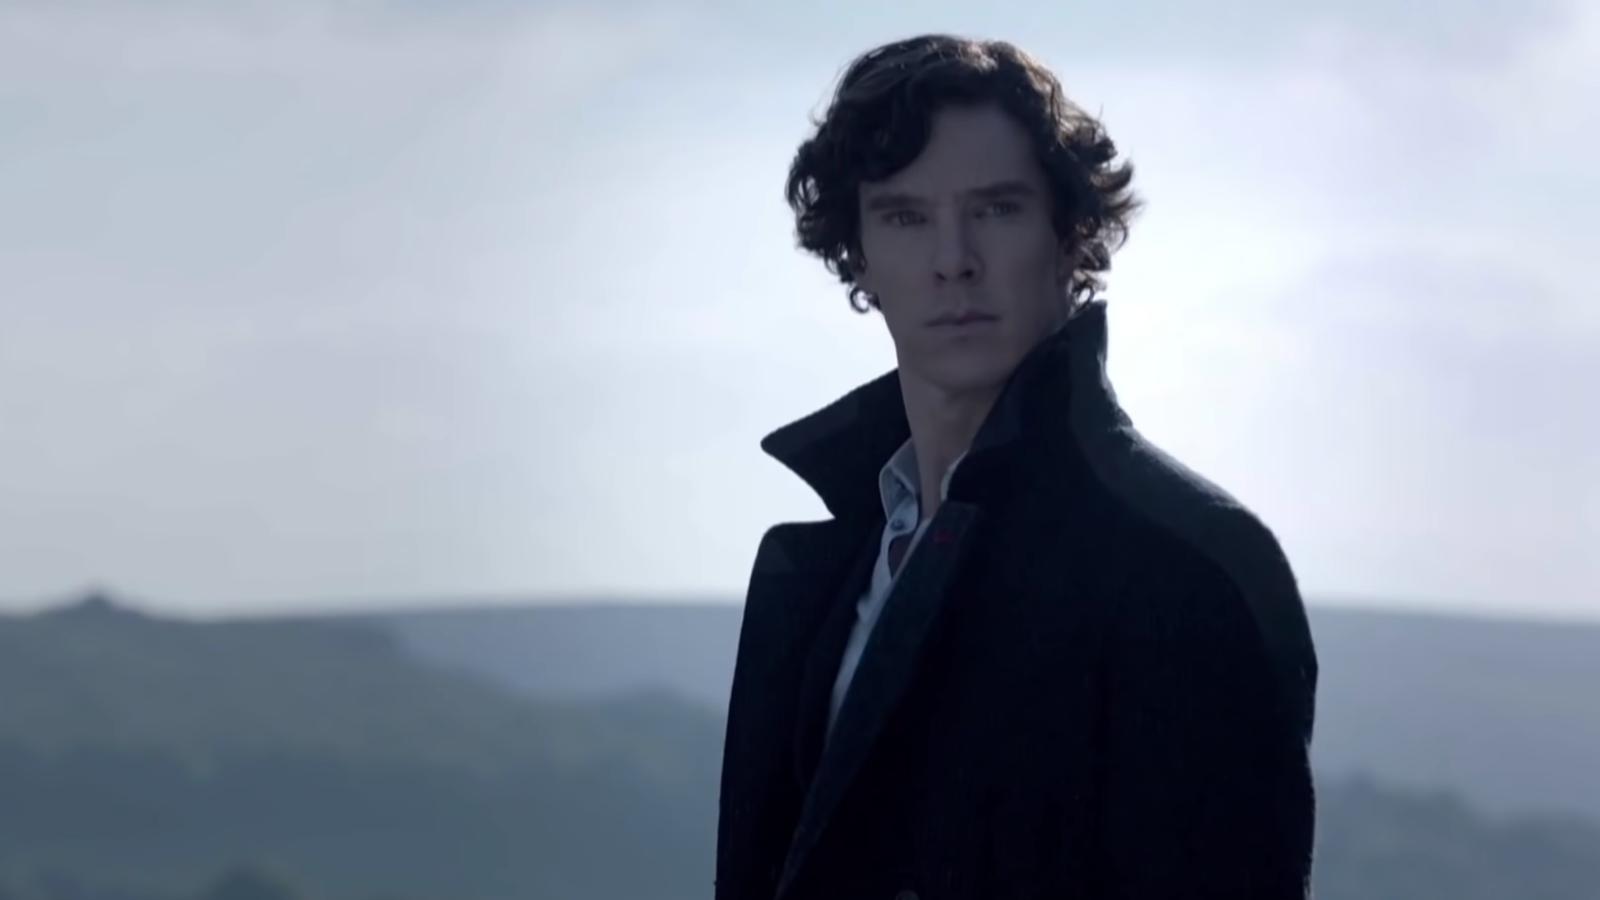 QnA VBage How BBC's Sherlock subverts the